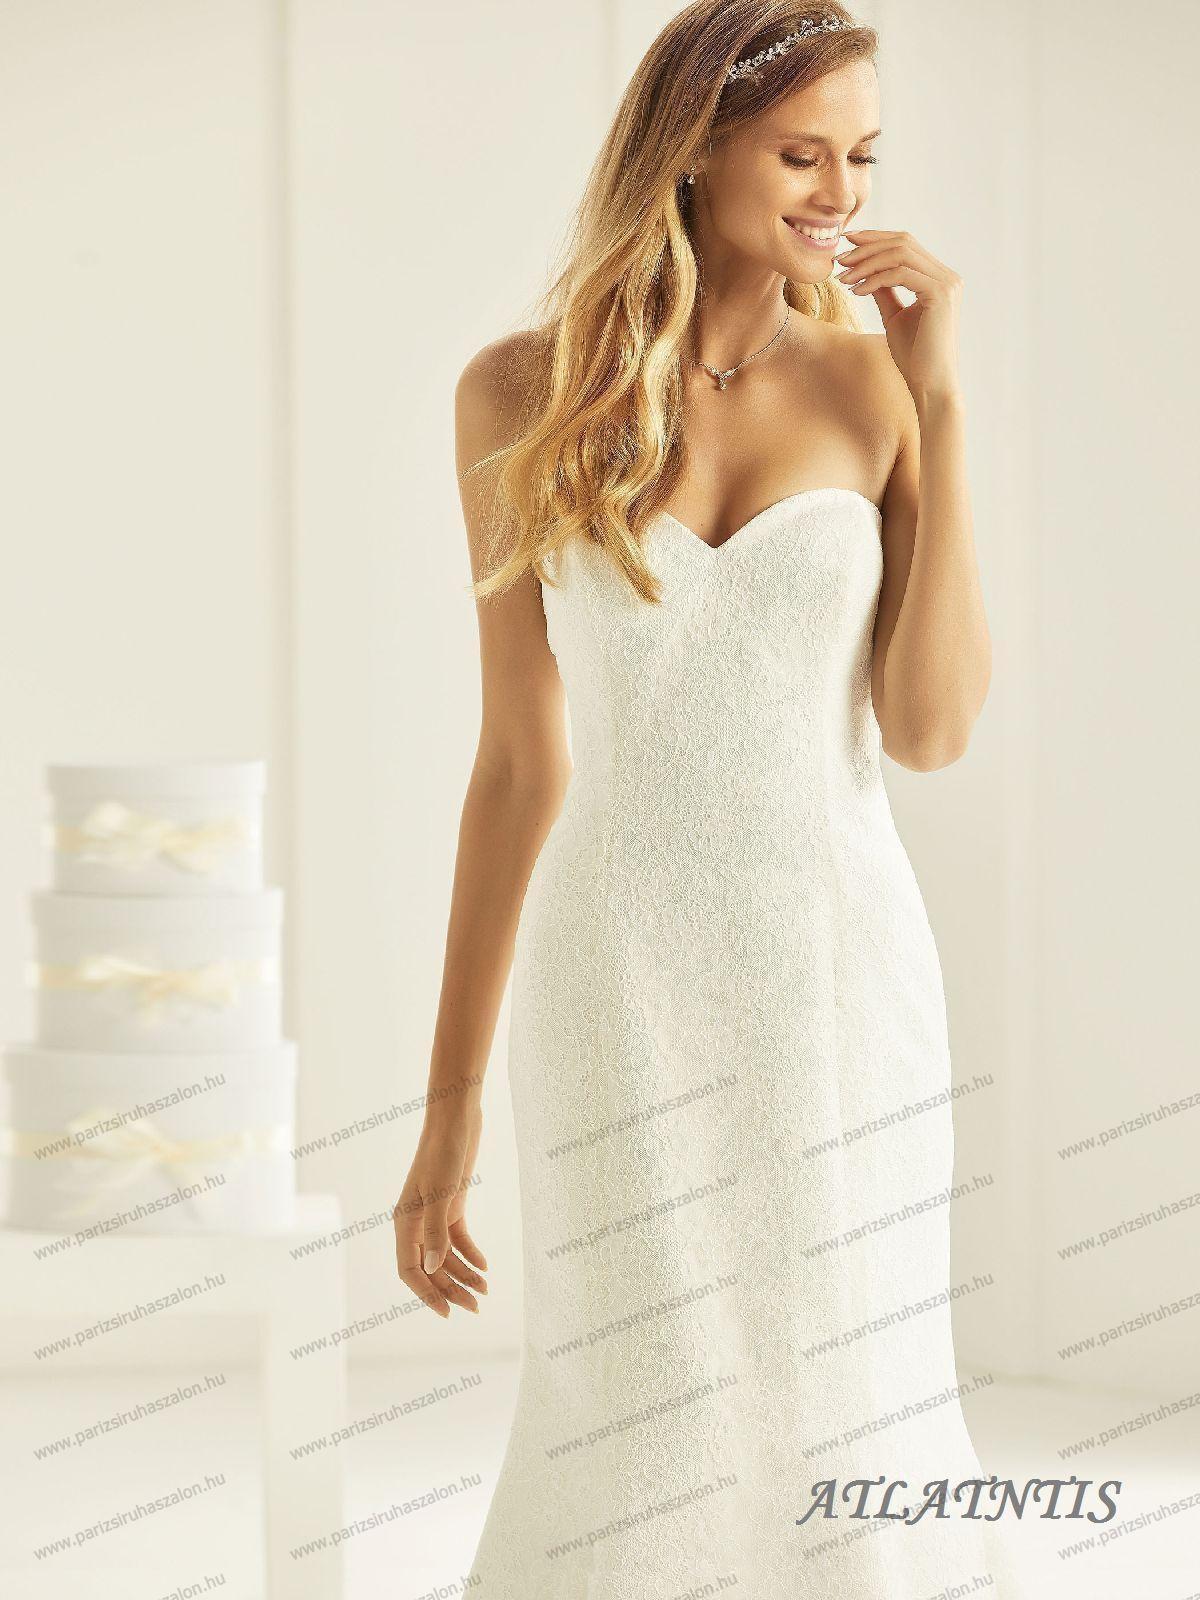 ATLANTIS menyasszonyi ruha  0b207e6d0f